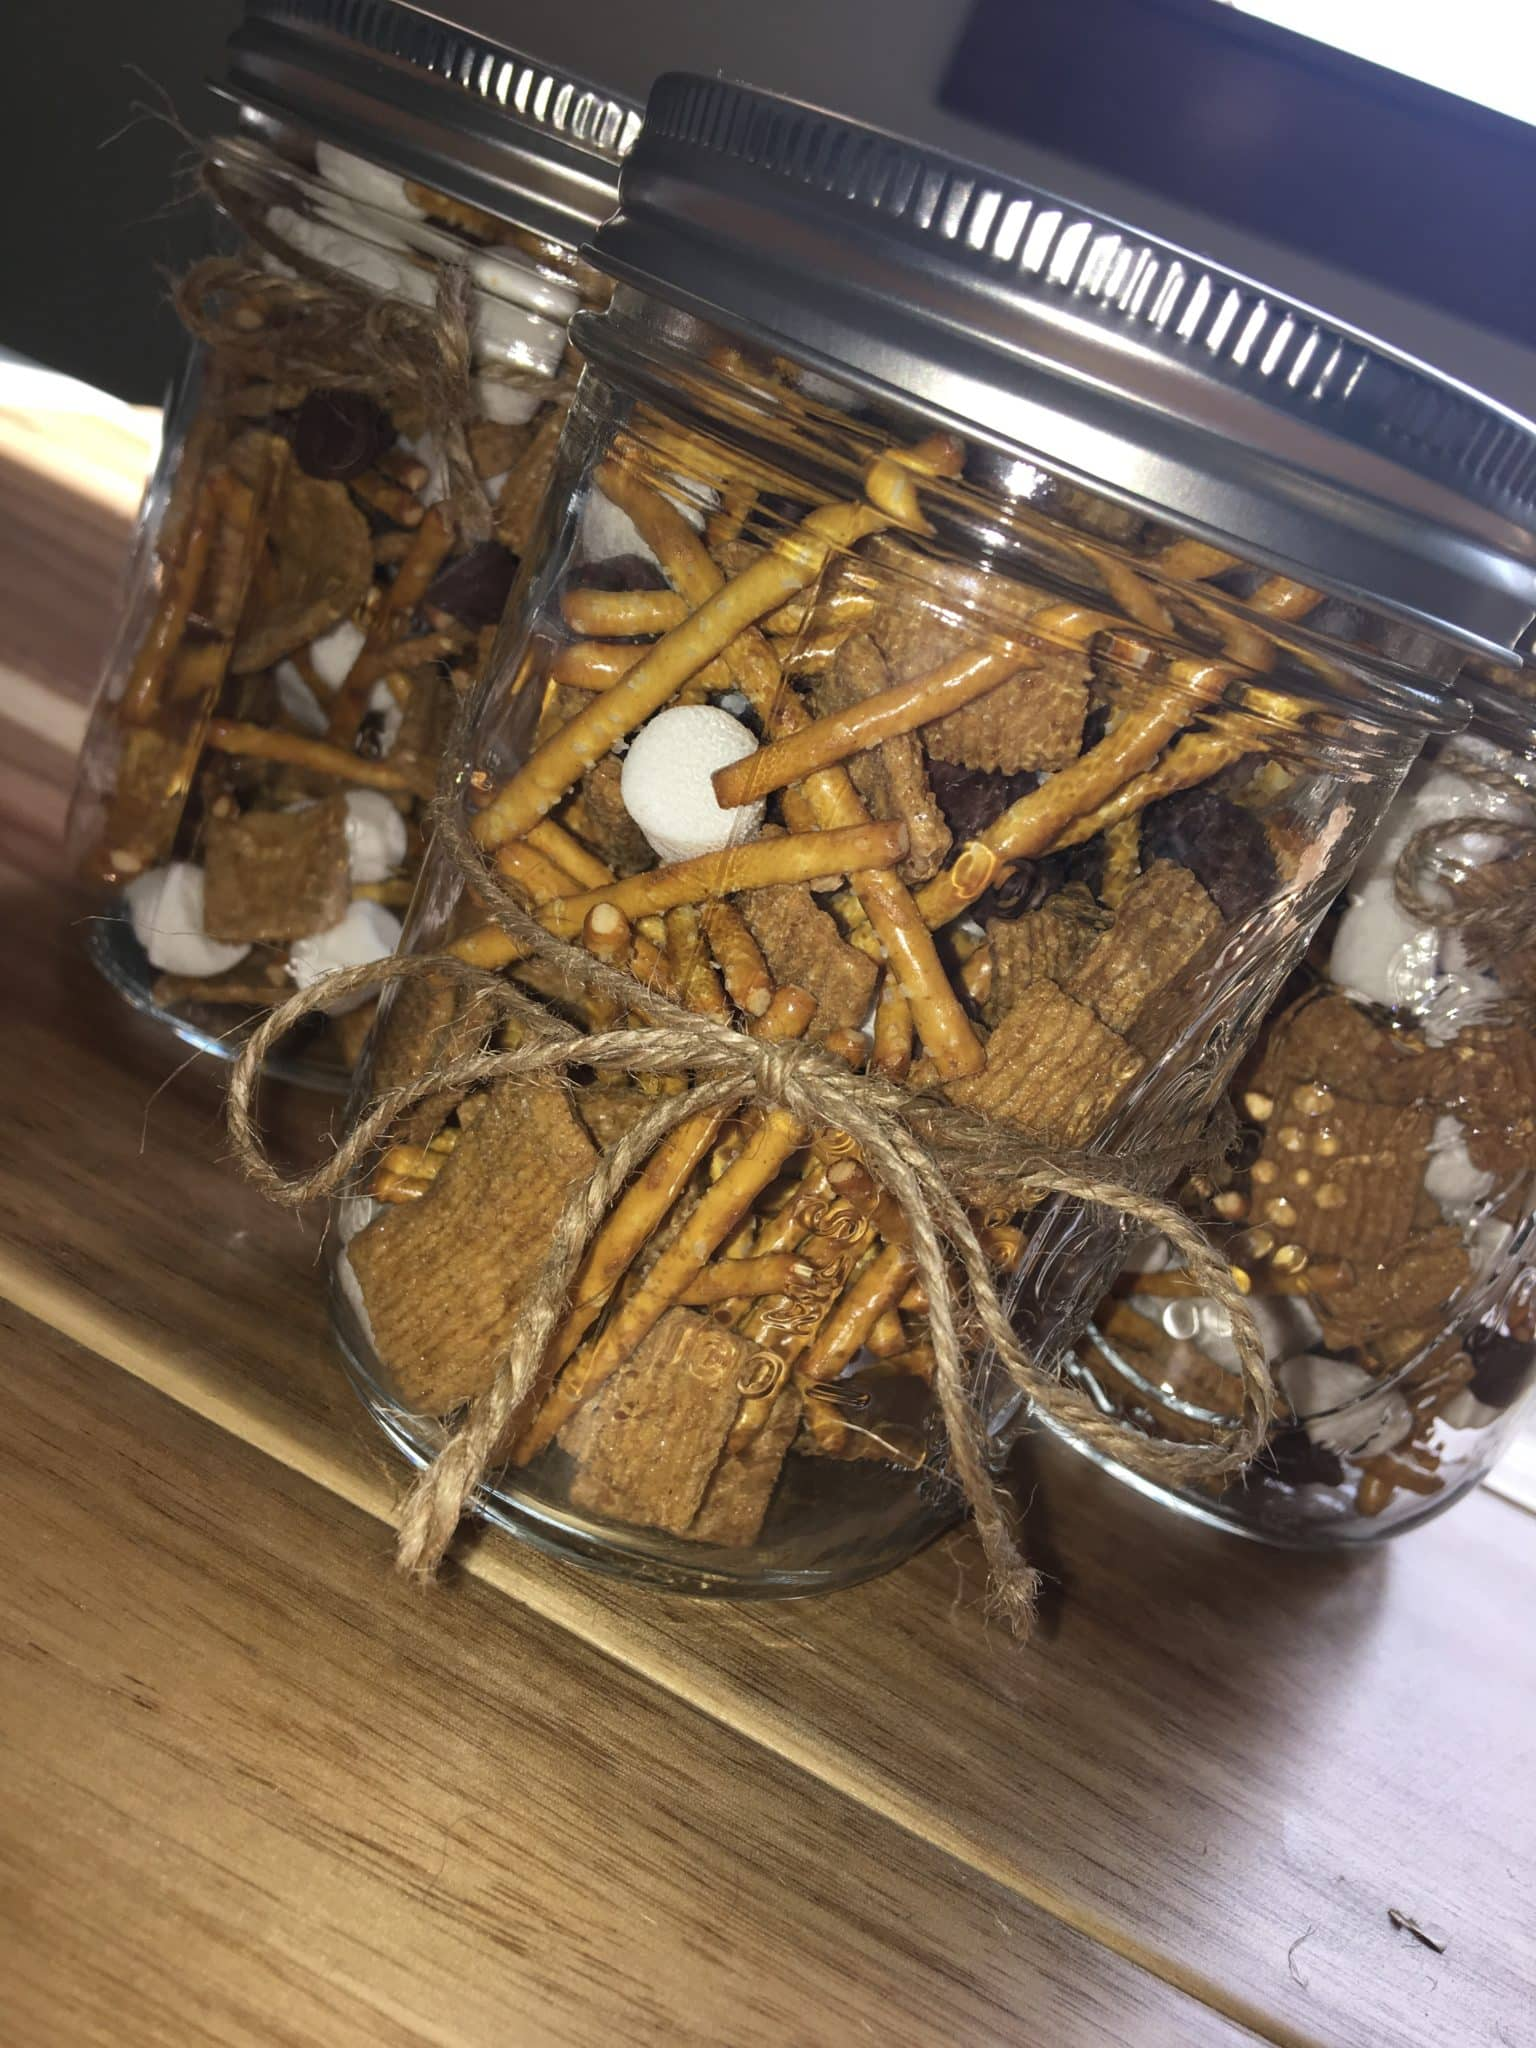 Smore snack mix gift in mason jar.